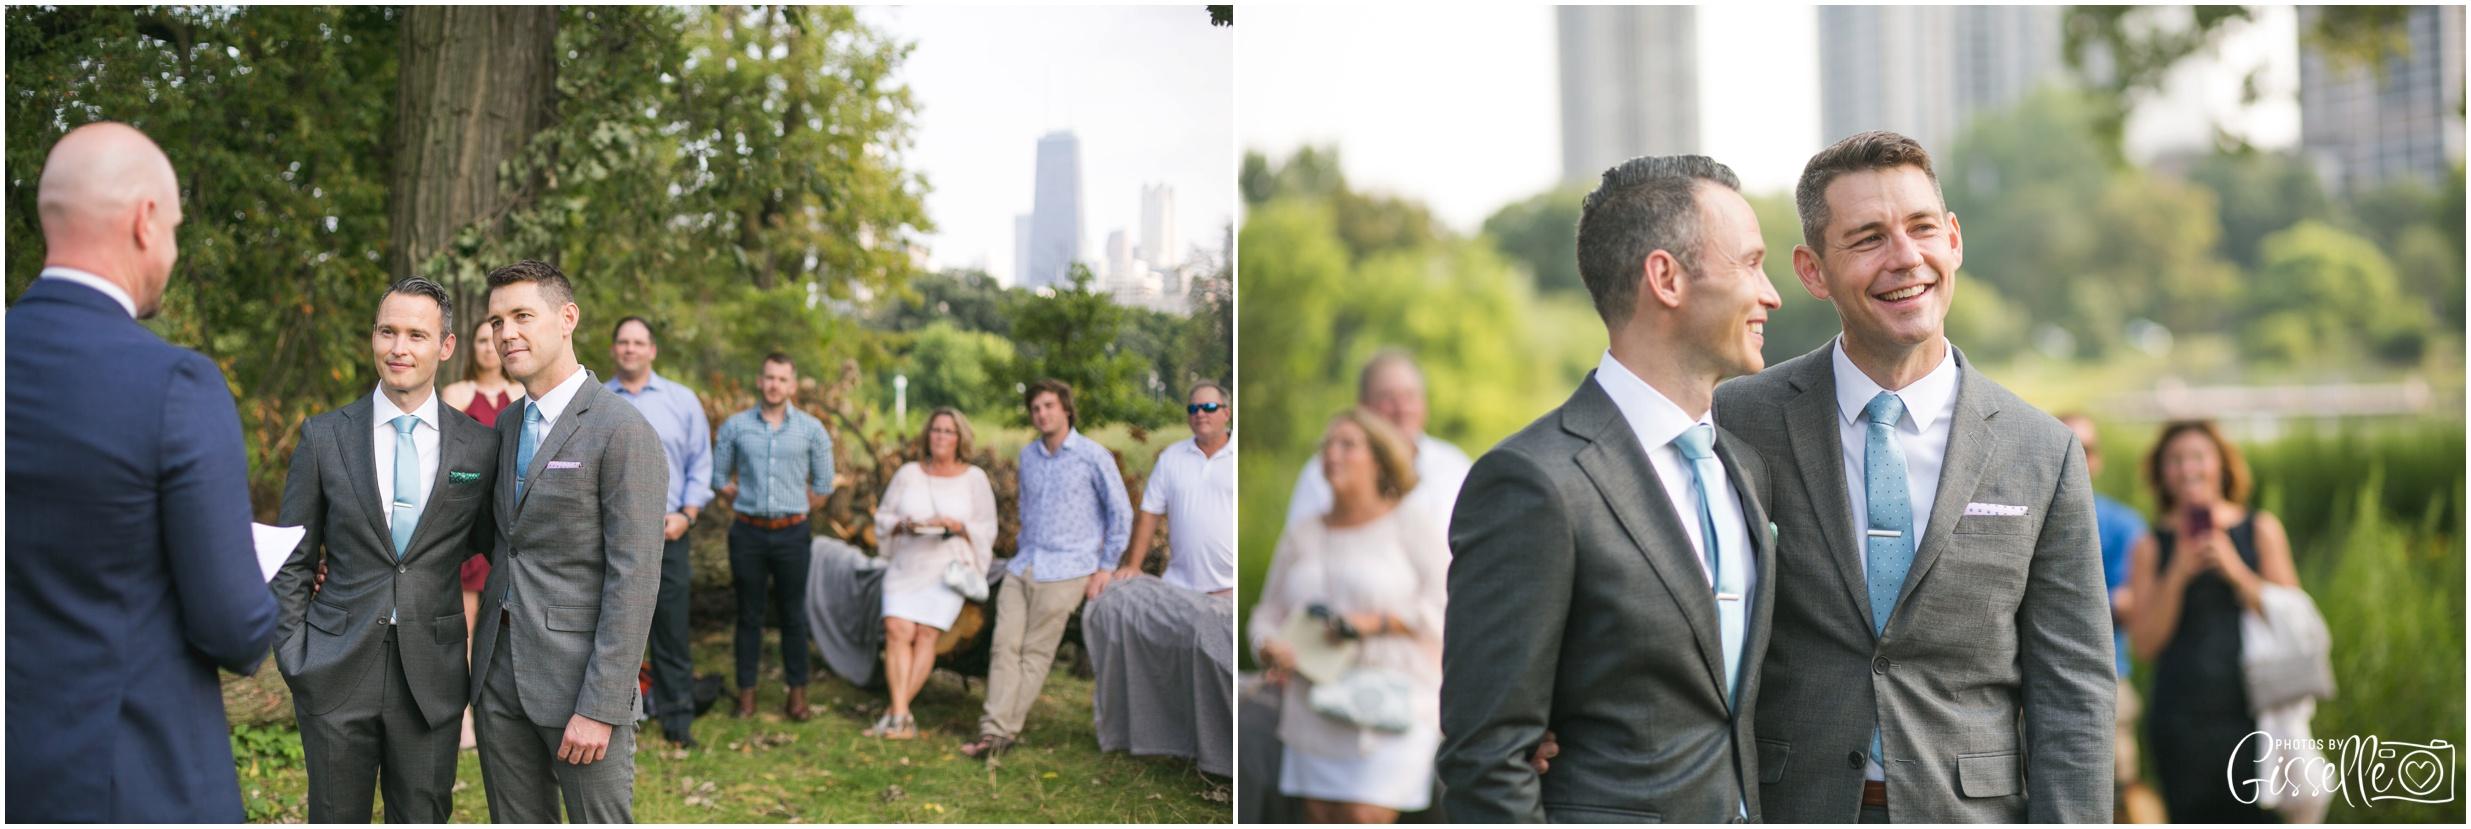 Lincoln Park Wedding_0006.jpg